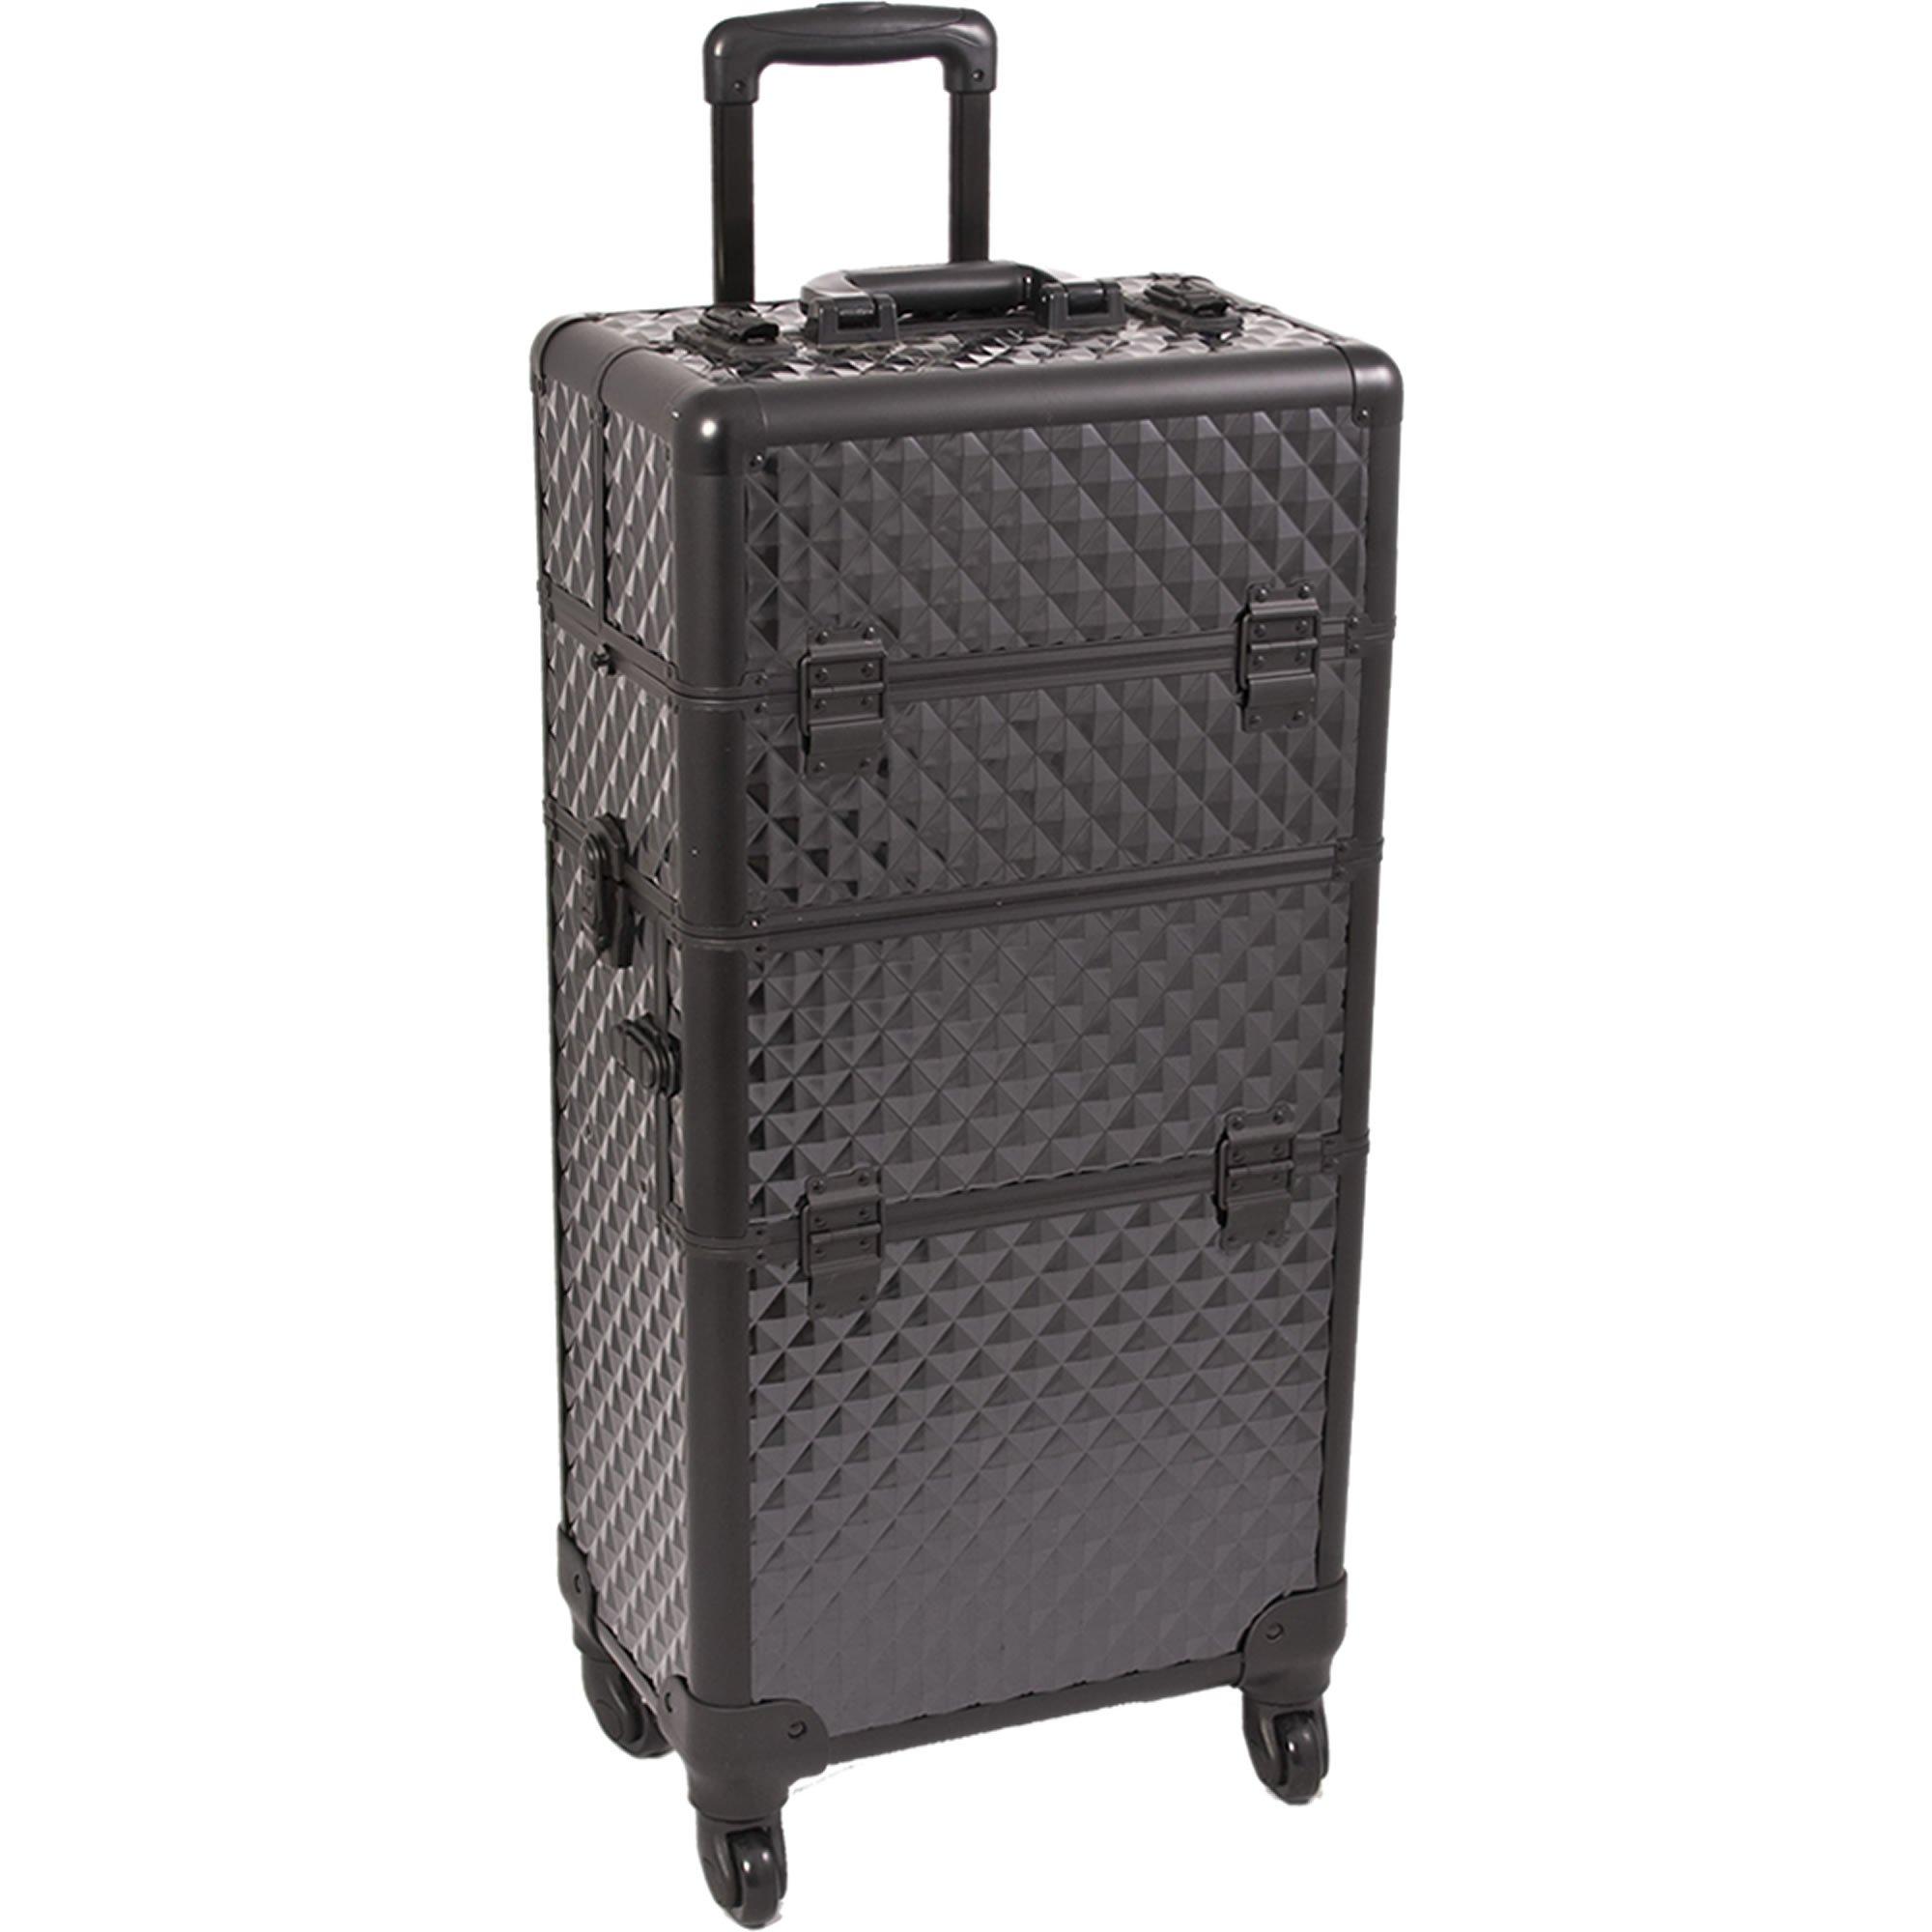 SUNRISE Makeup Case on Wheels 2 in 1 Professional Organizer I3461, 6 Trays, 4 Wheel Spinner, Adjustable Drawer Dividers, Black Diamond